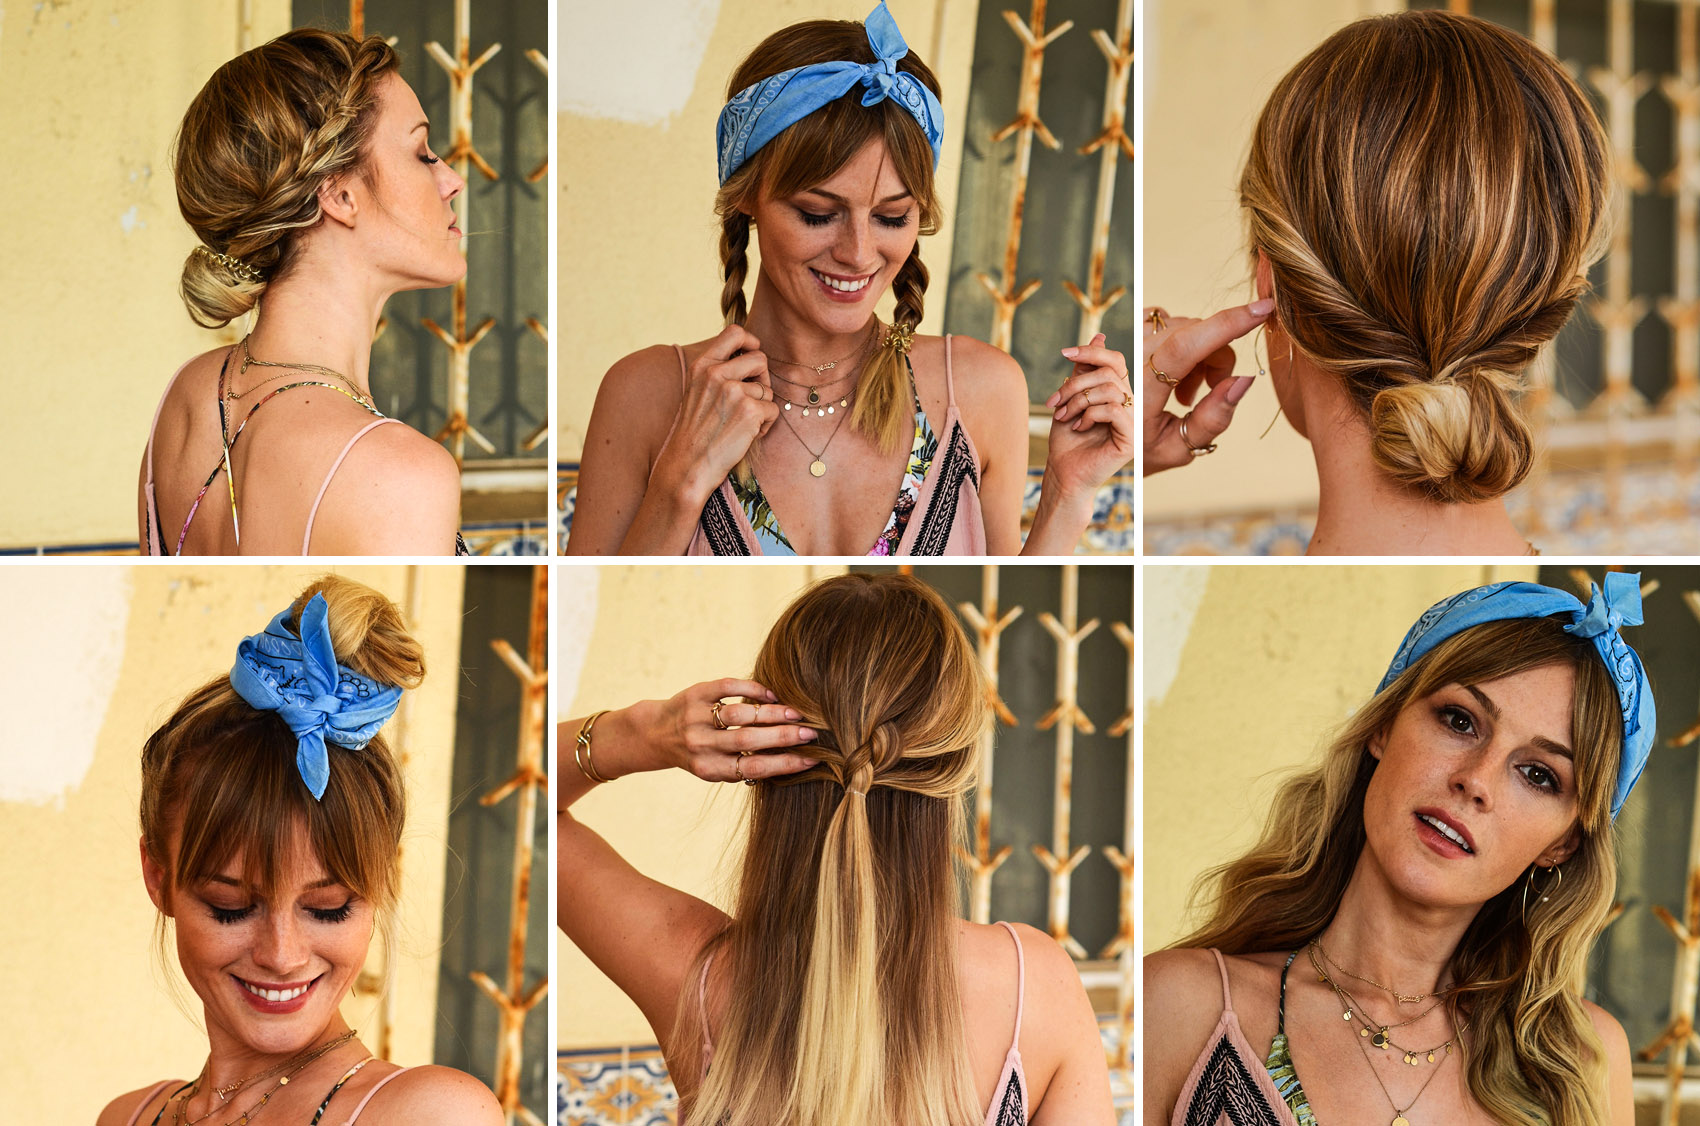 frisuren, beachfrisuren, bandana, hairstyles, beachwaves, strandfrisur, flechten, flechtfrisur, zwirbelfrisur